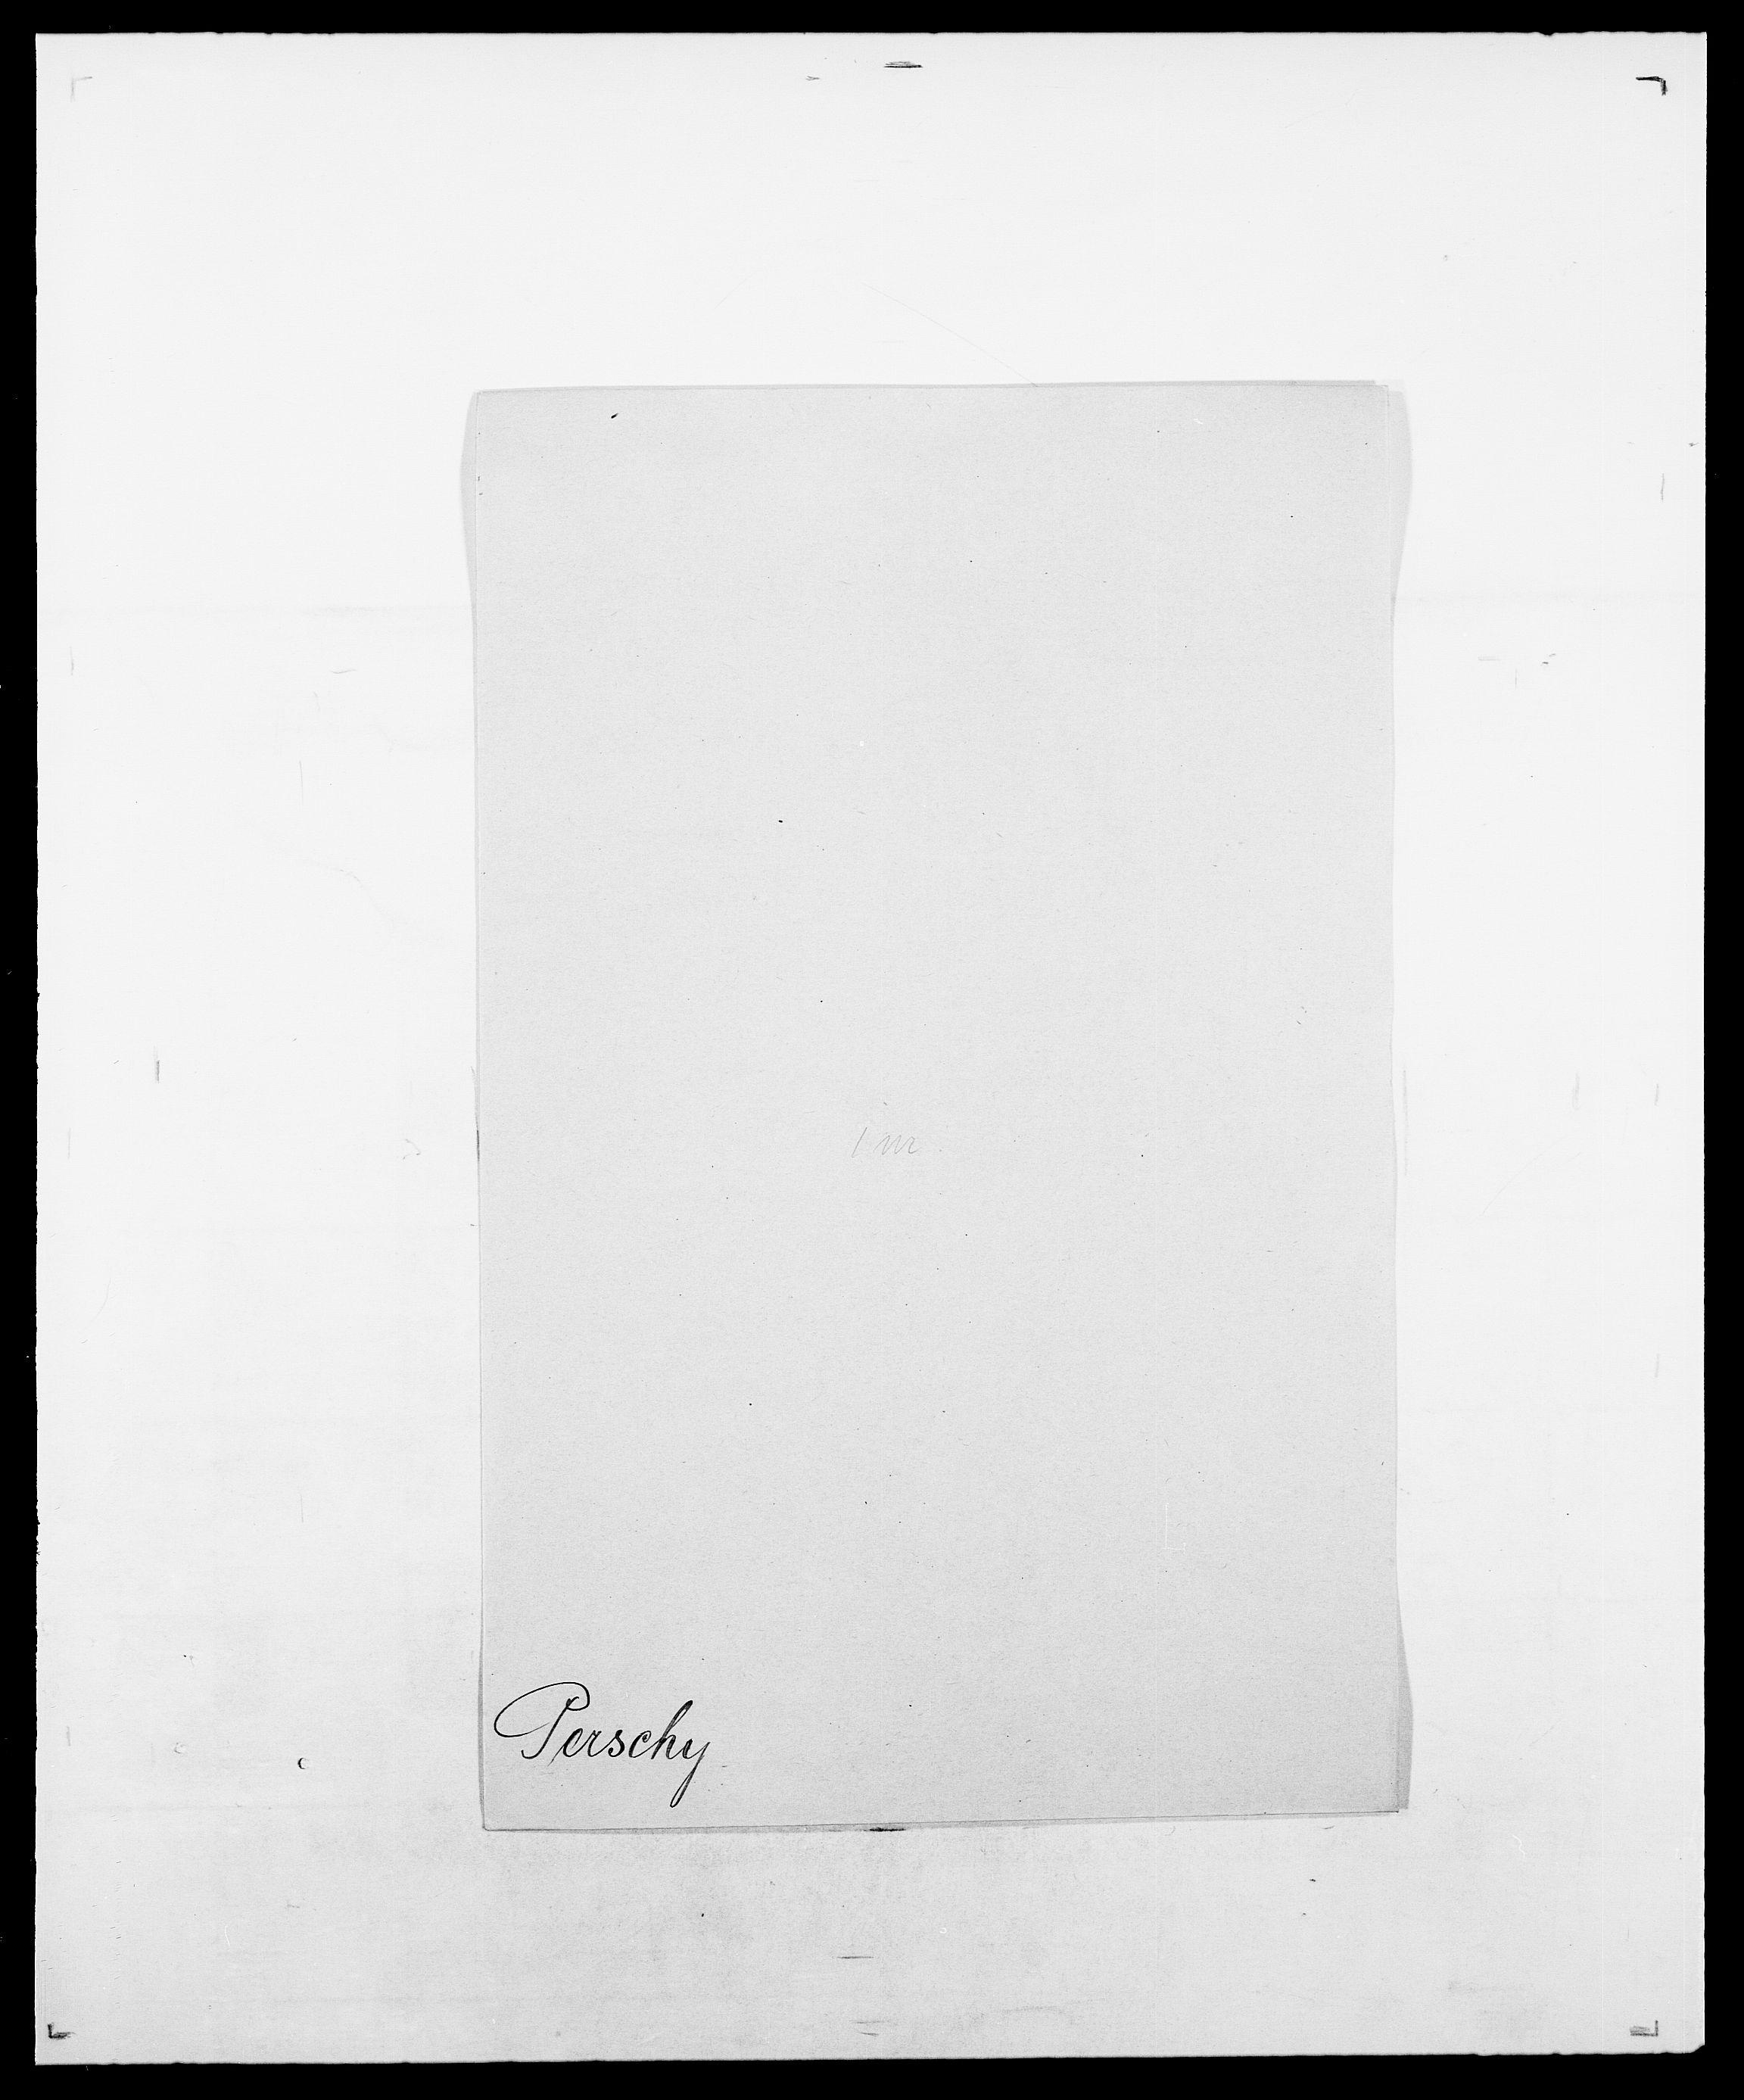 SAO, Delgobe, Charles Antoine - samling, D/Da/L0030: Paars - Pittelkov, s. 370